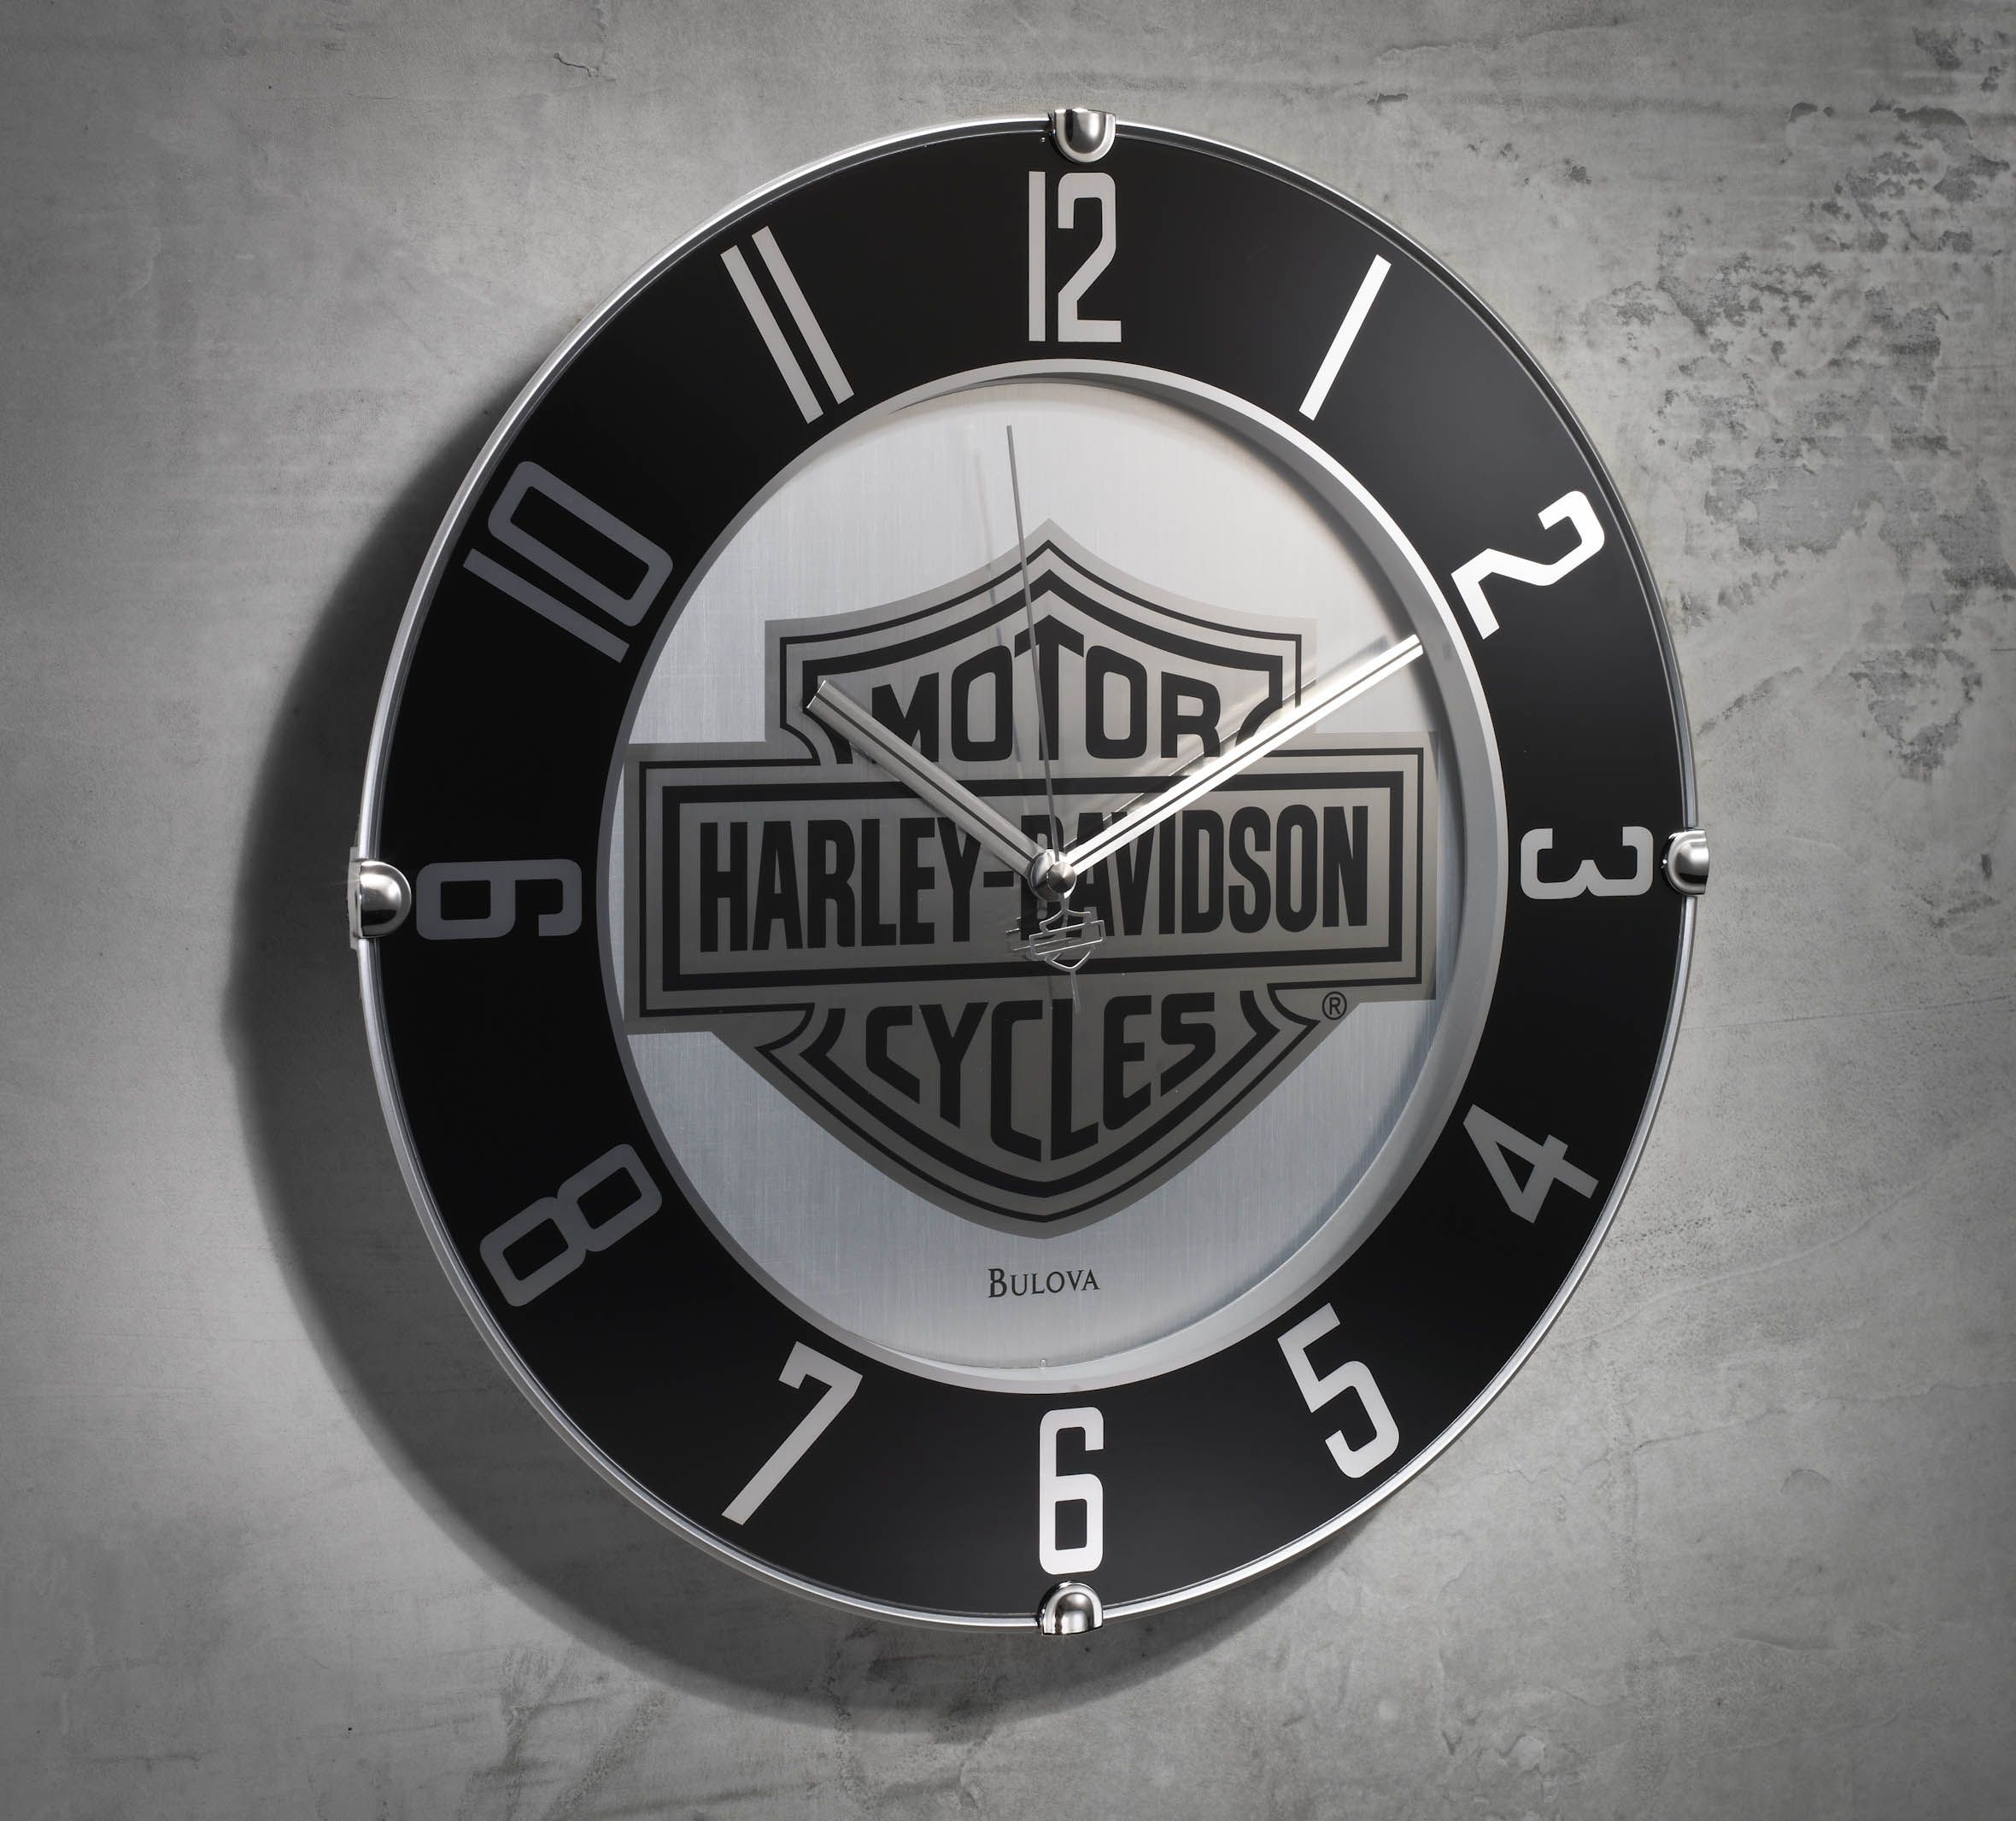 Harley Davidson Motorcycle Bar Shield Logo Neon Table Or: Harley-Davidson Mirrored Bar